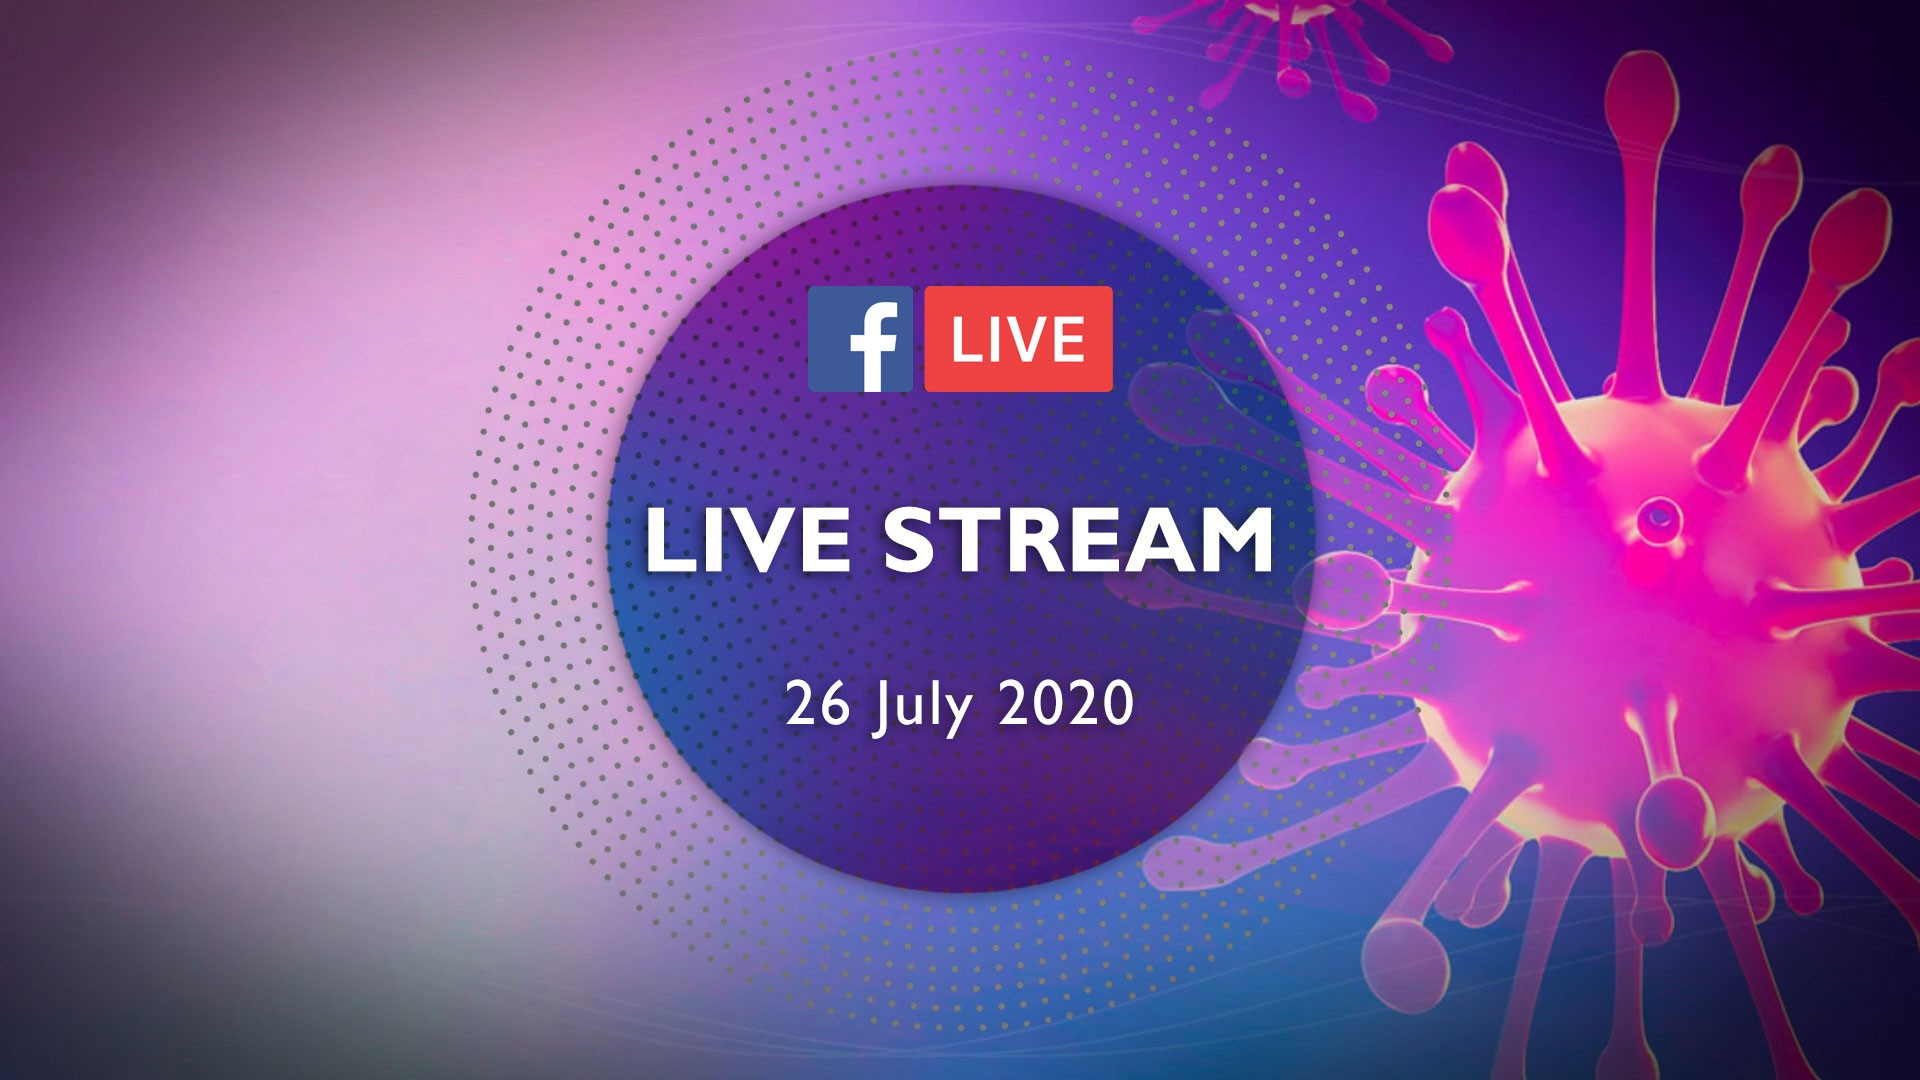 CV-Live-Stream-26th-July-2020-Featl